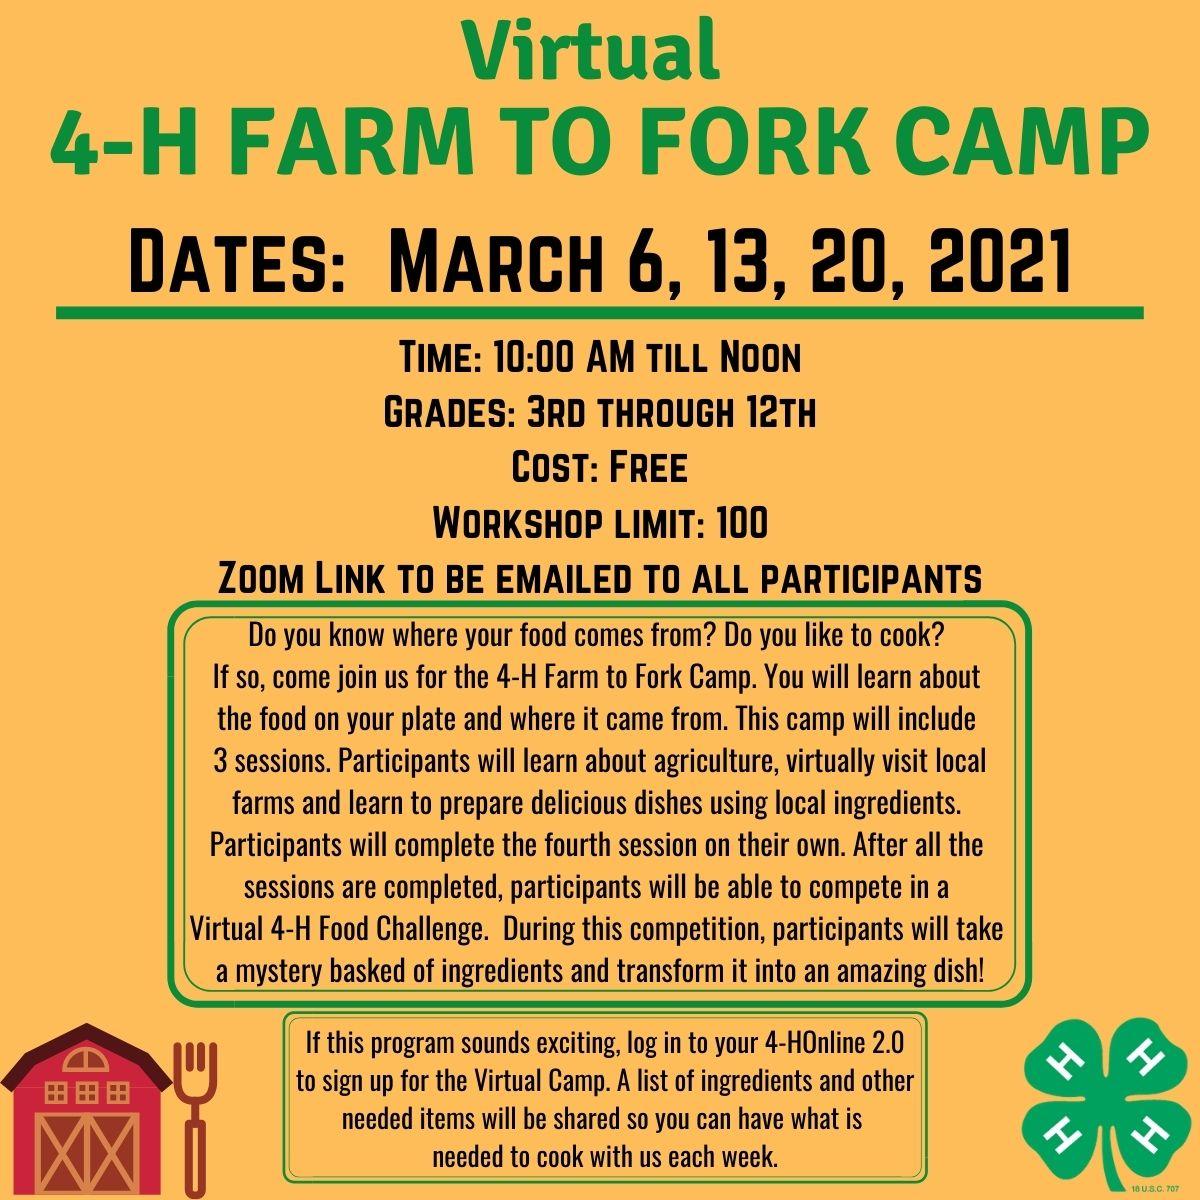 4-H Farm to Fork Camp flyer image